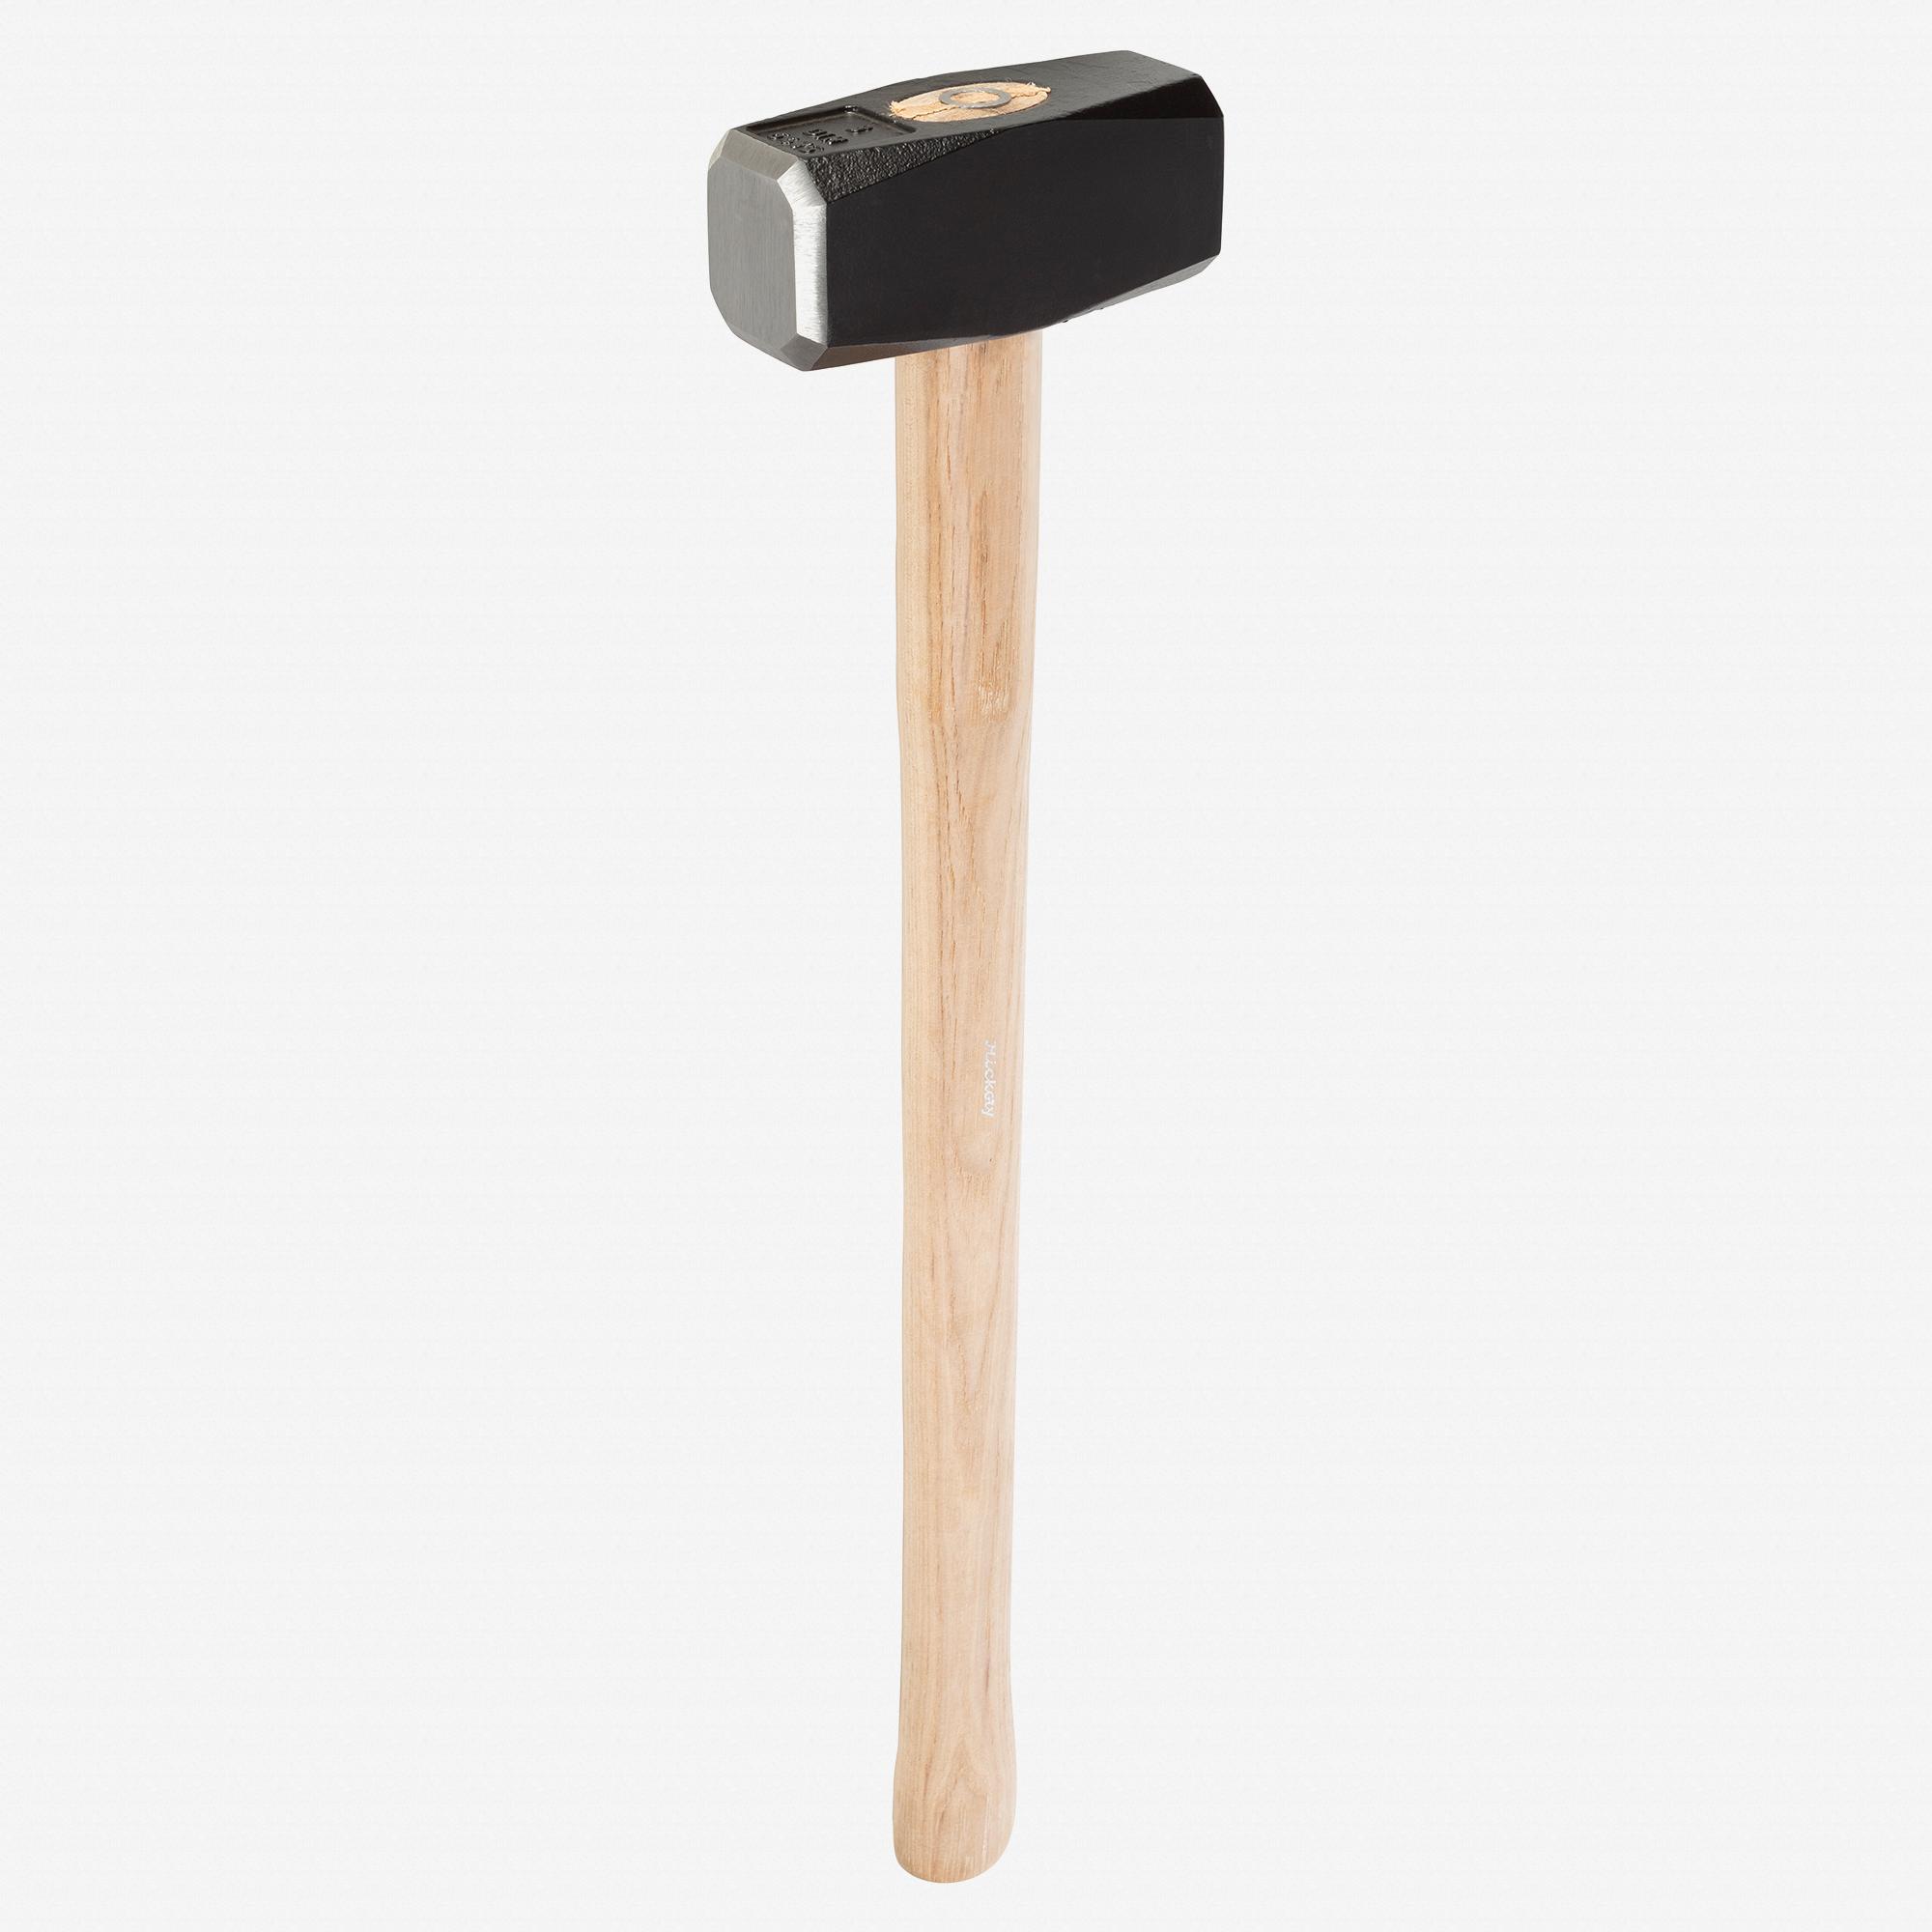 Picard 8.8 lb Mining Sledge - KC Tool